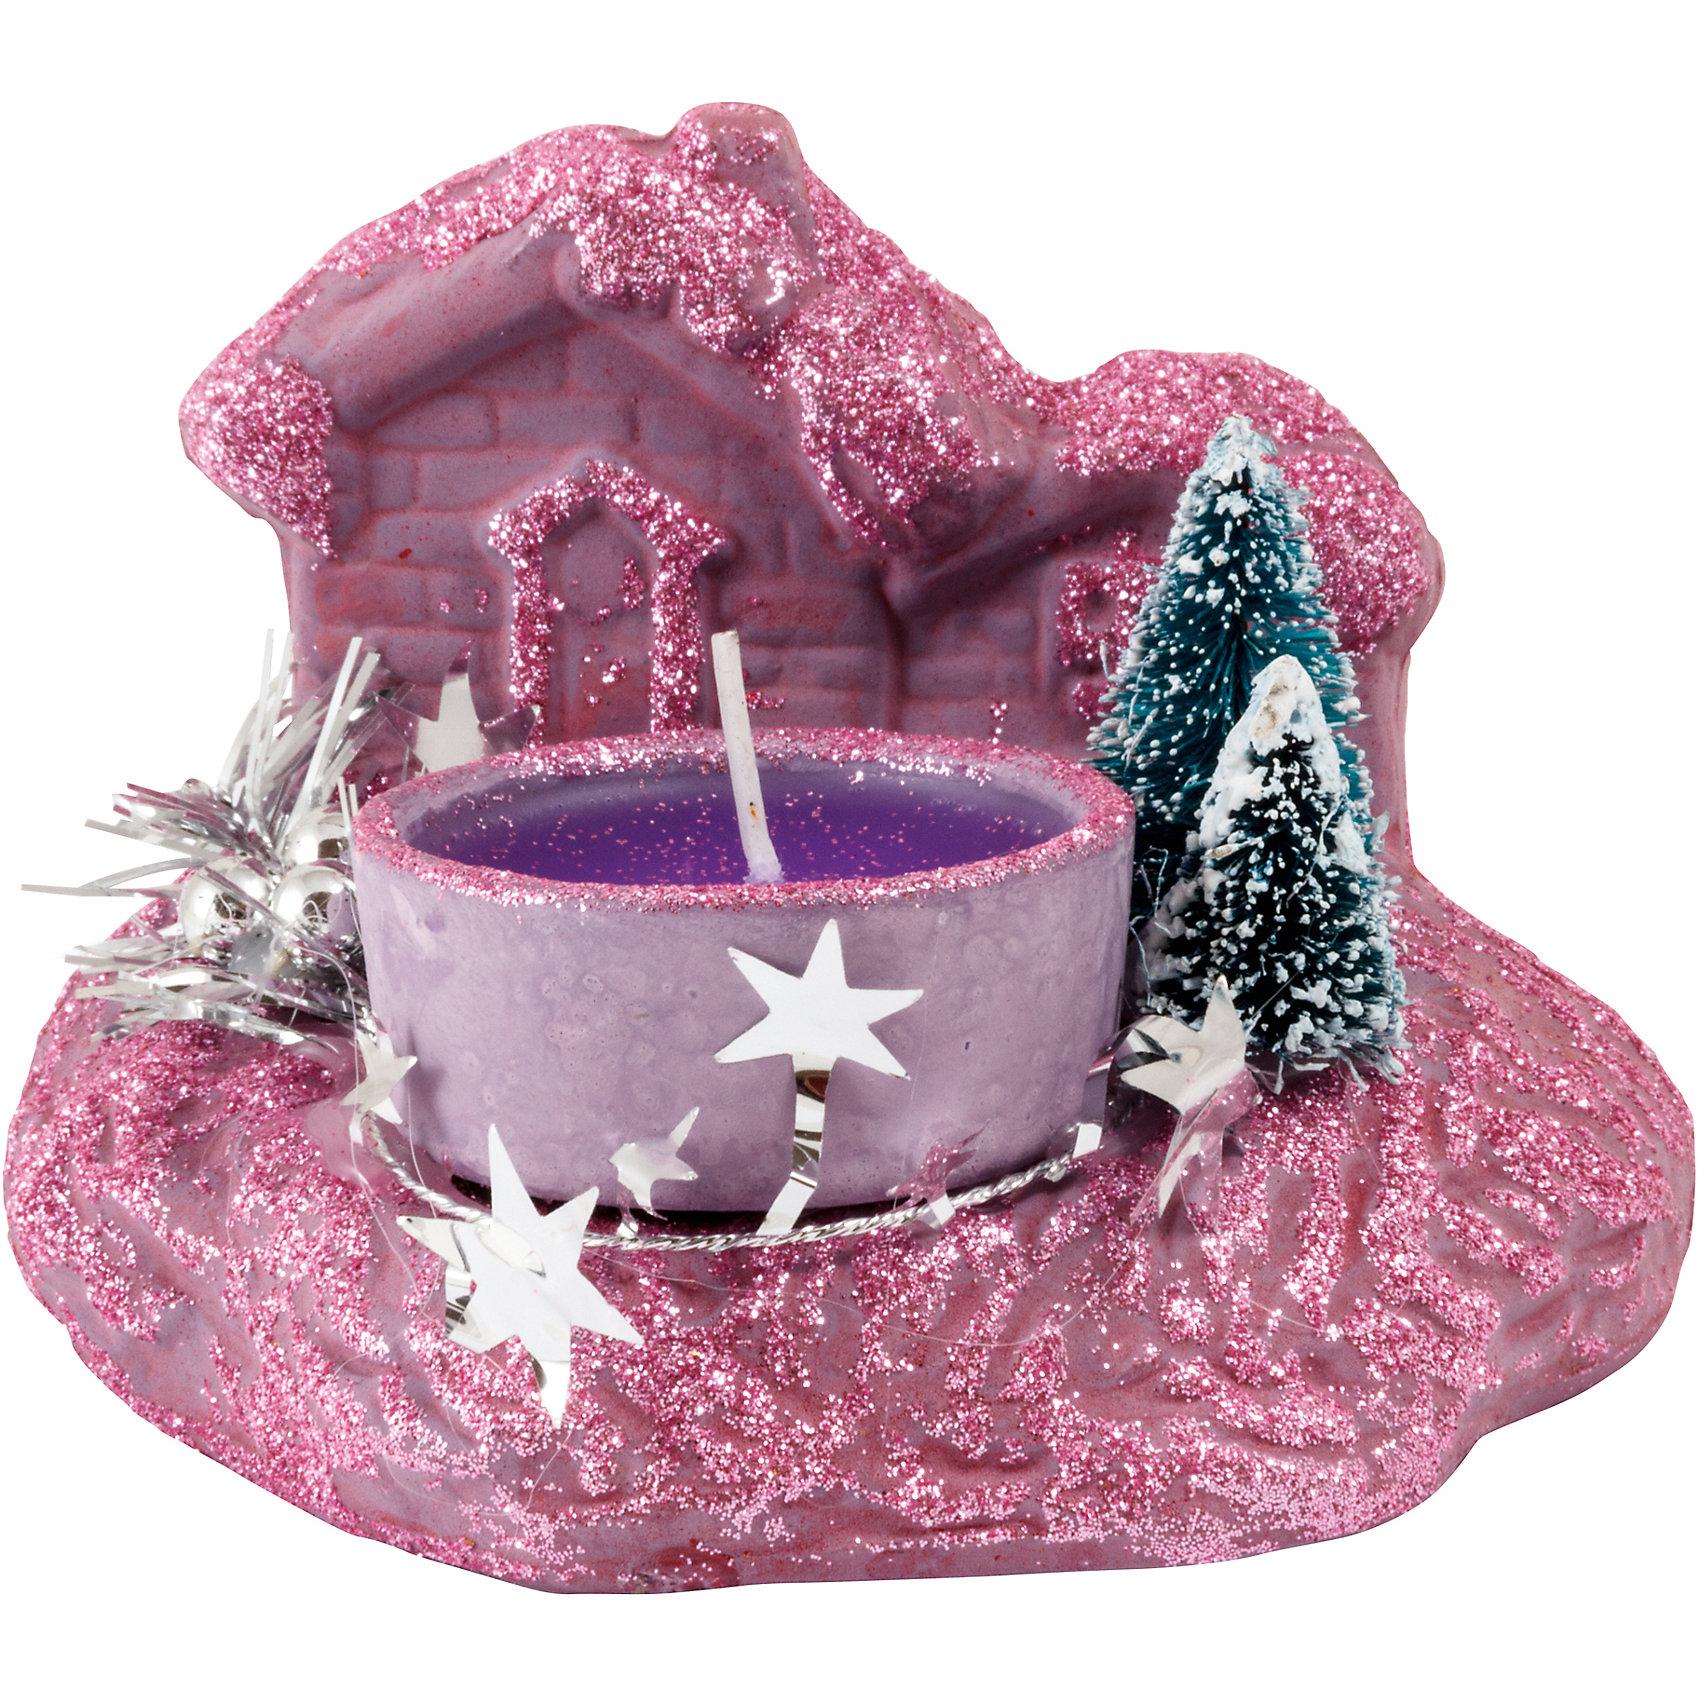 Свеча «Зимняя деревня» с подставкой